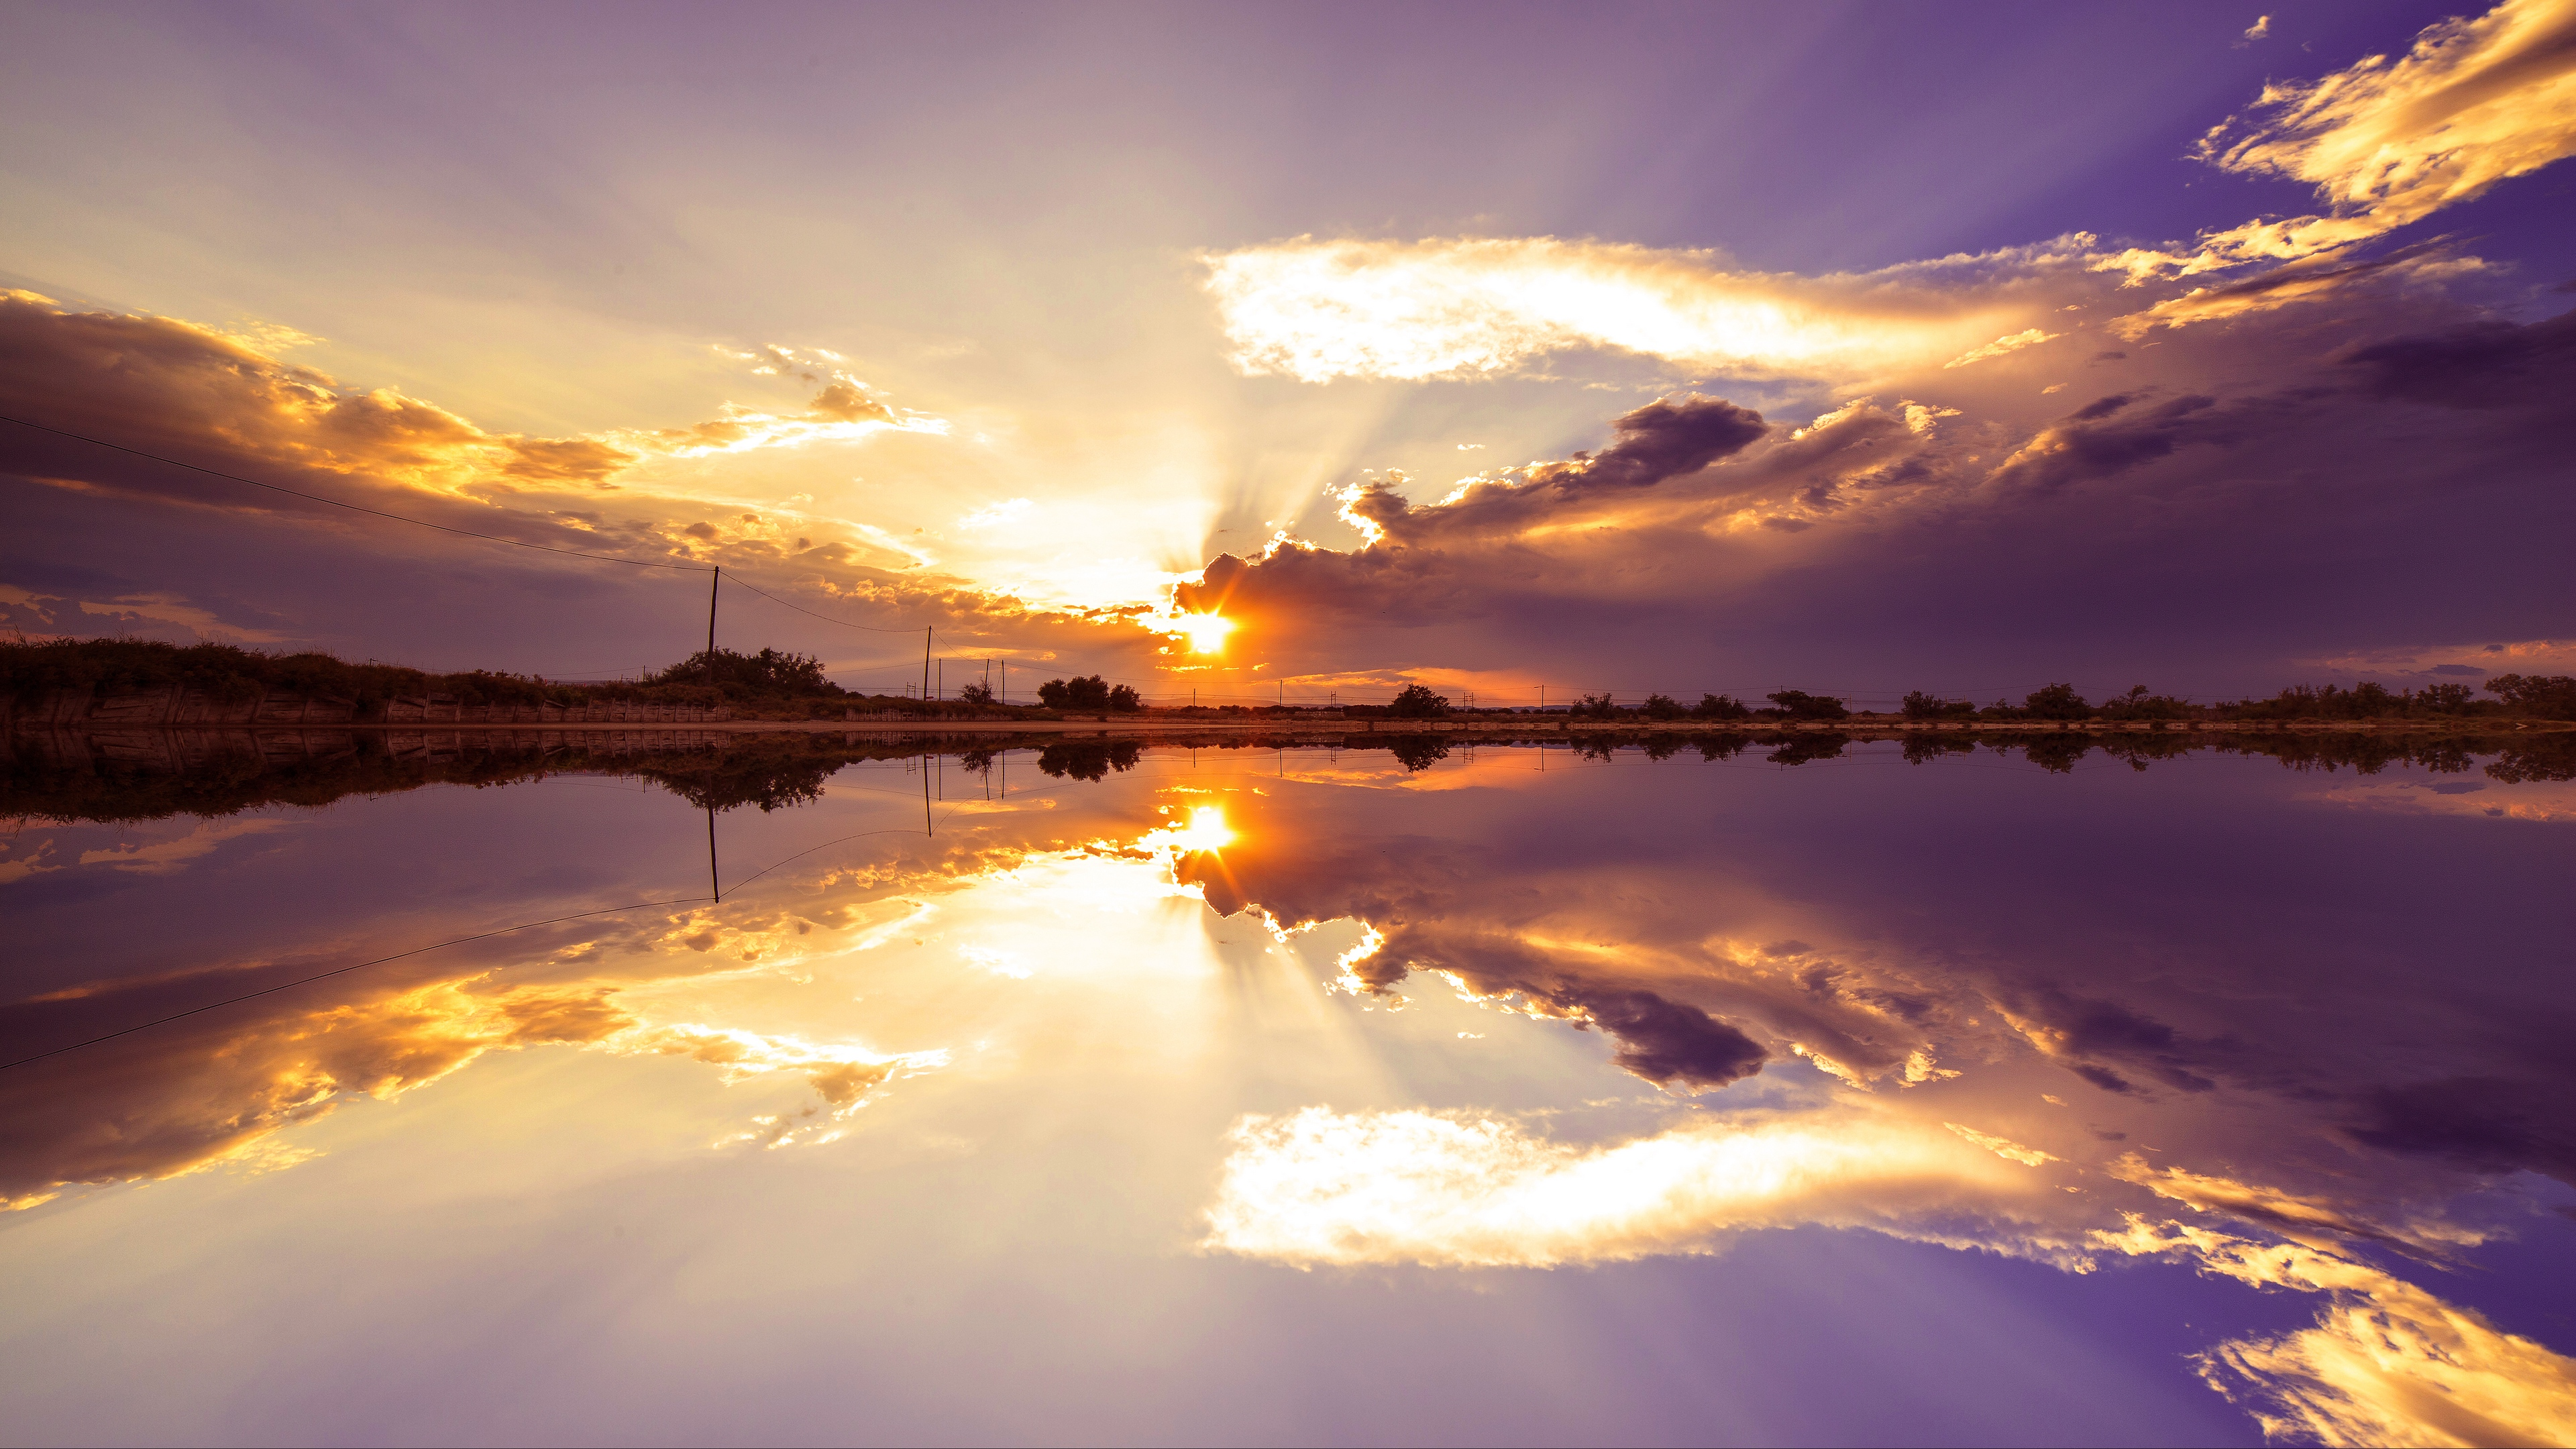 sunset skyline lake clouds saint lucia 4k 1541117326 - sunset, skyline, lake, clouds, saint lucia 4k - sunset, Skyline, Lake